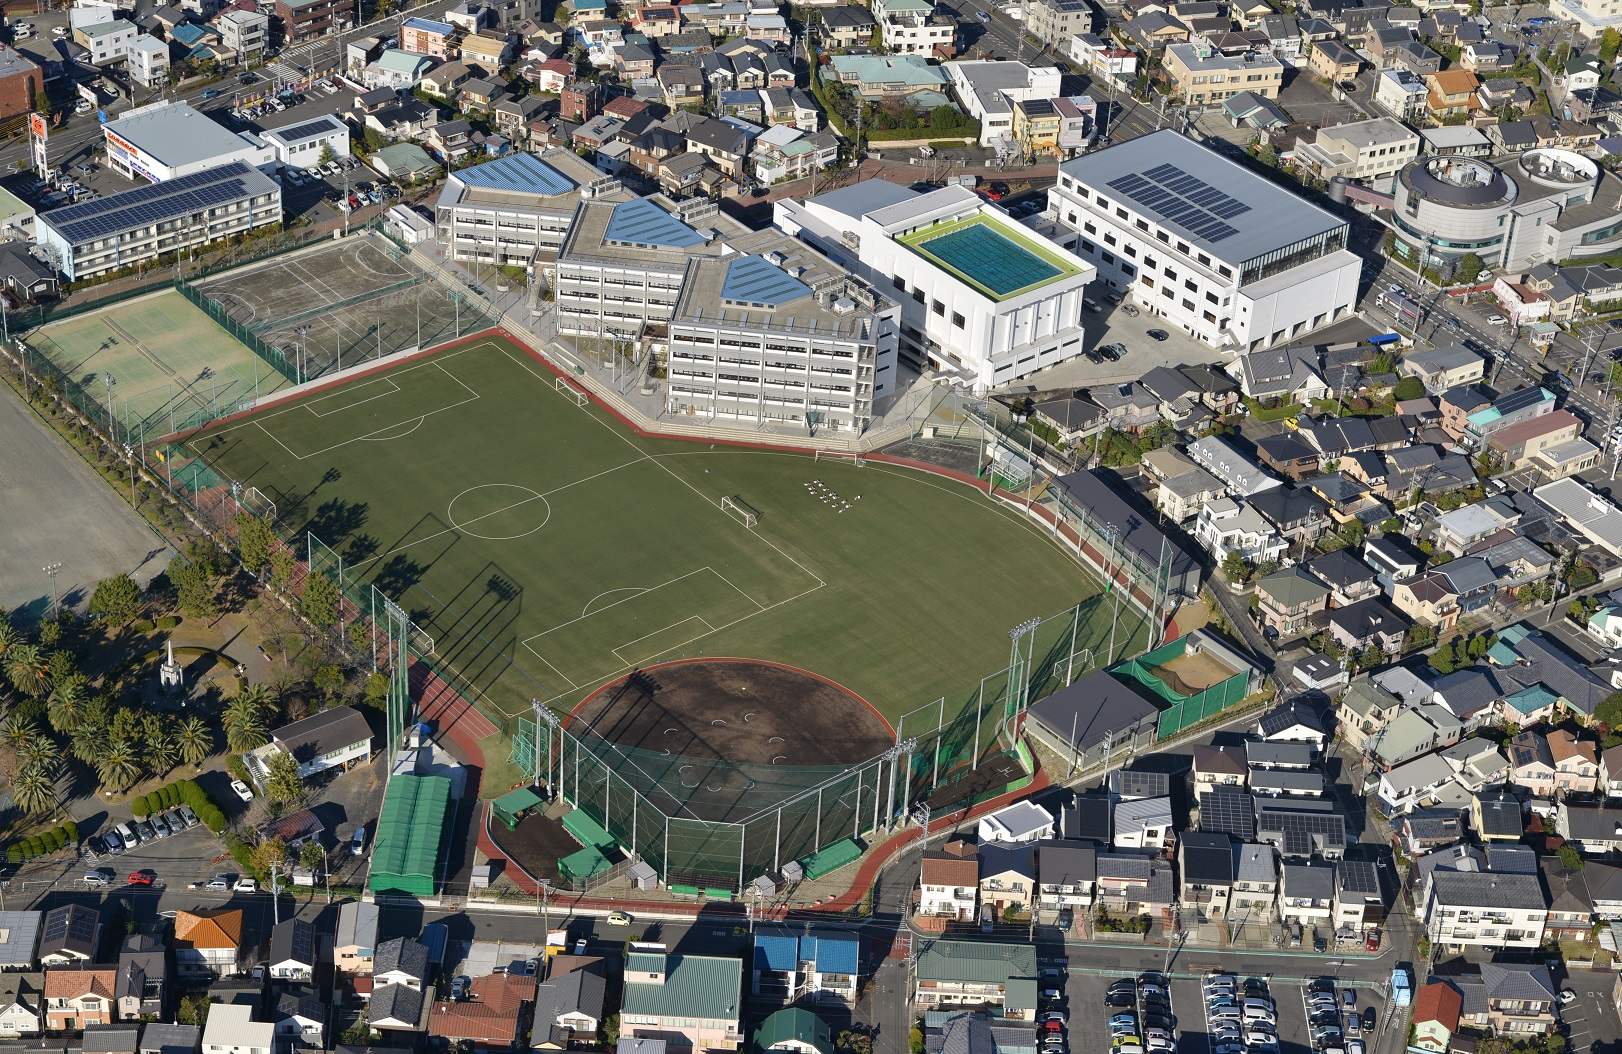 H26 清水桜が丘高等学校グラウンド人工芝舗装工事